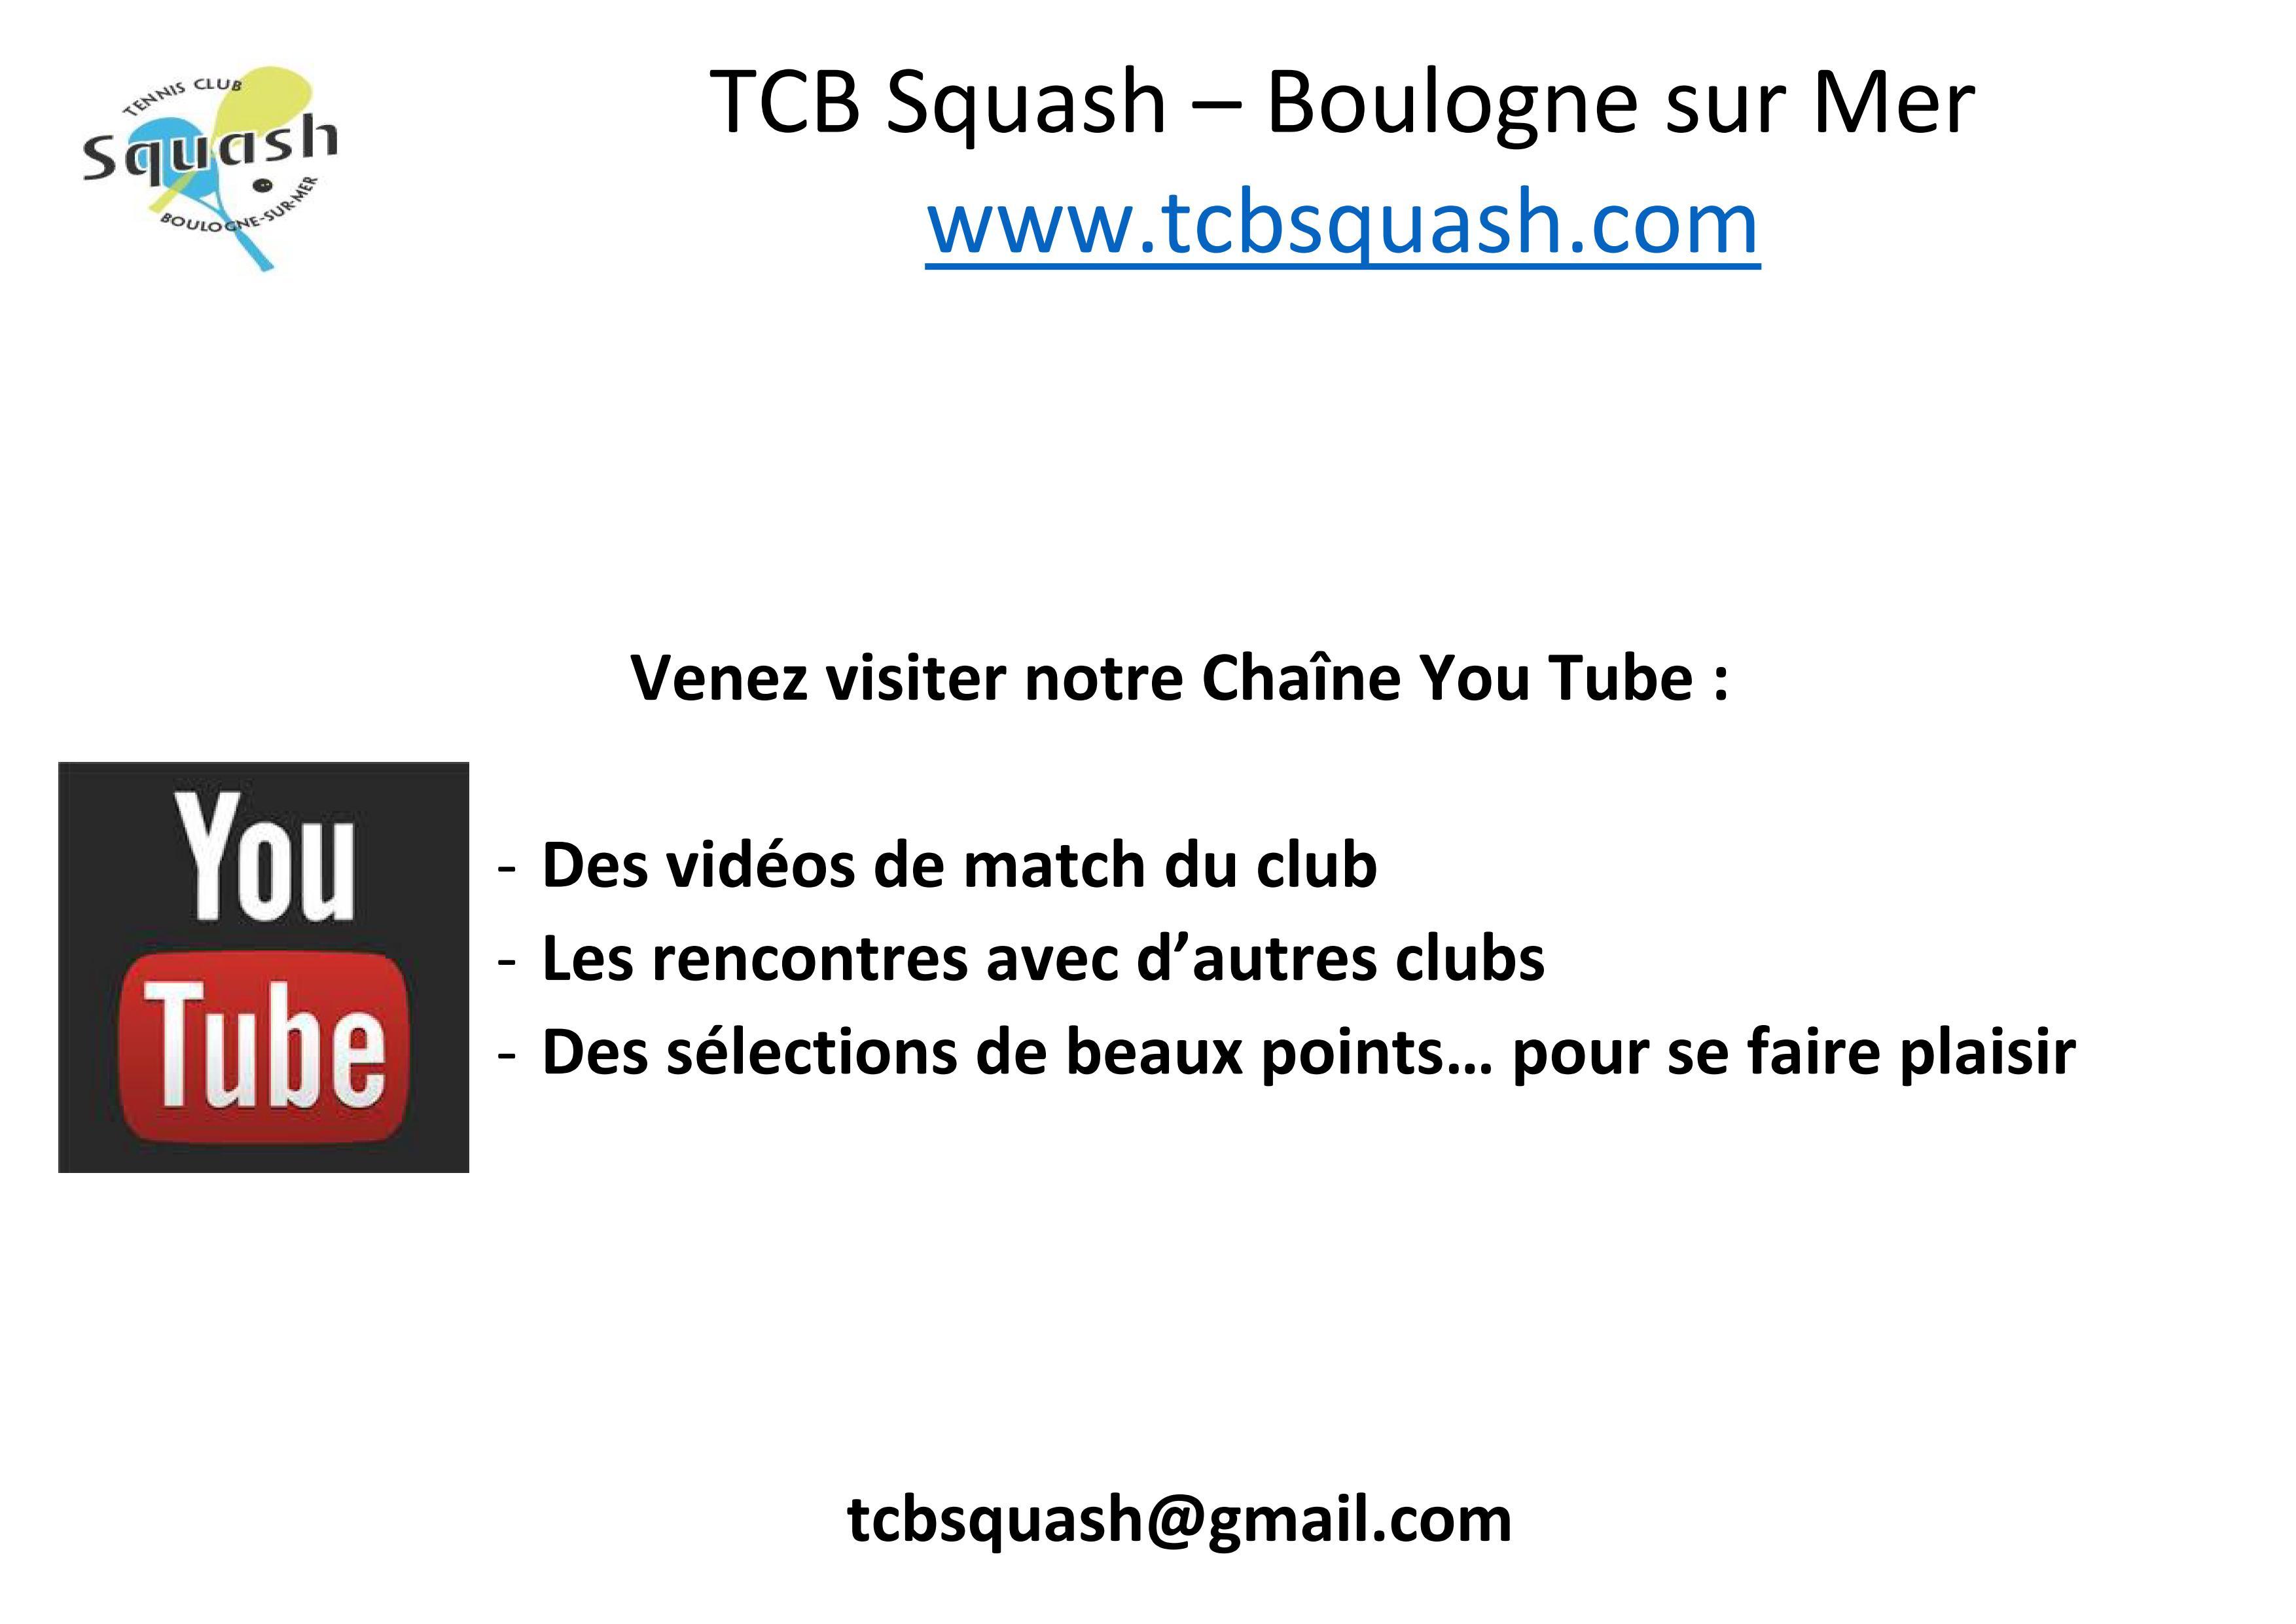 Notre Chaîne You Tube!